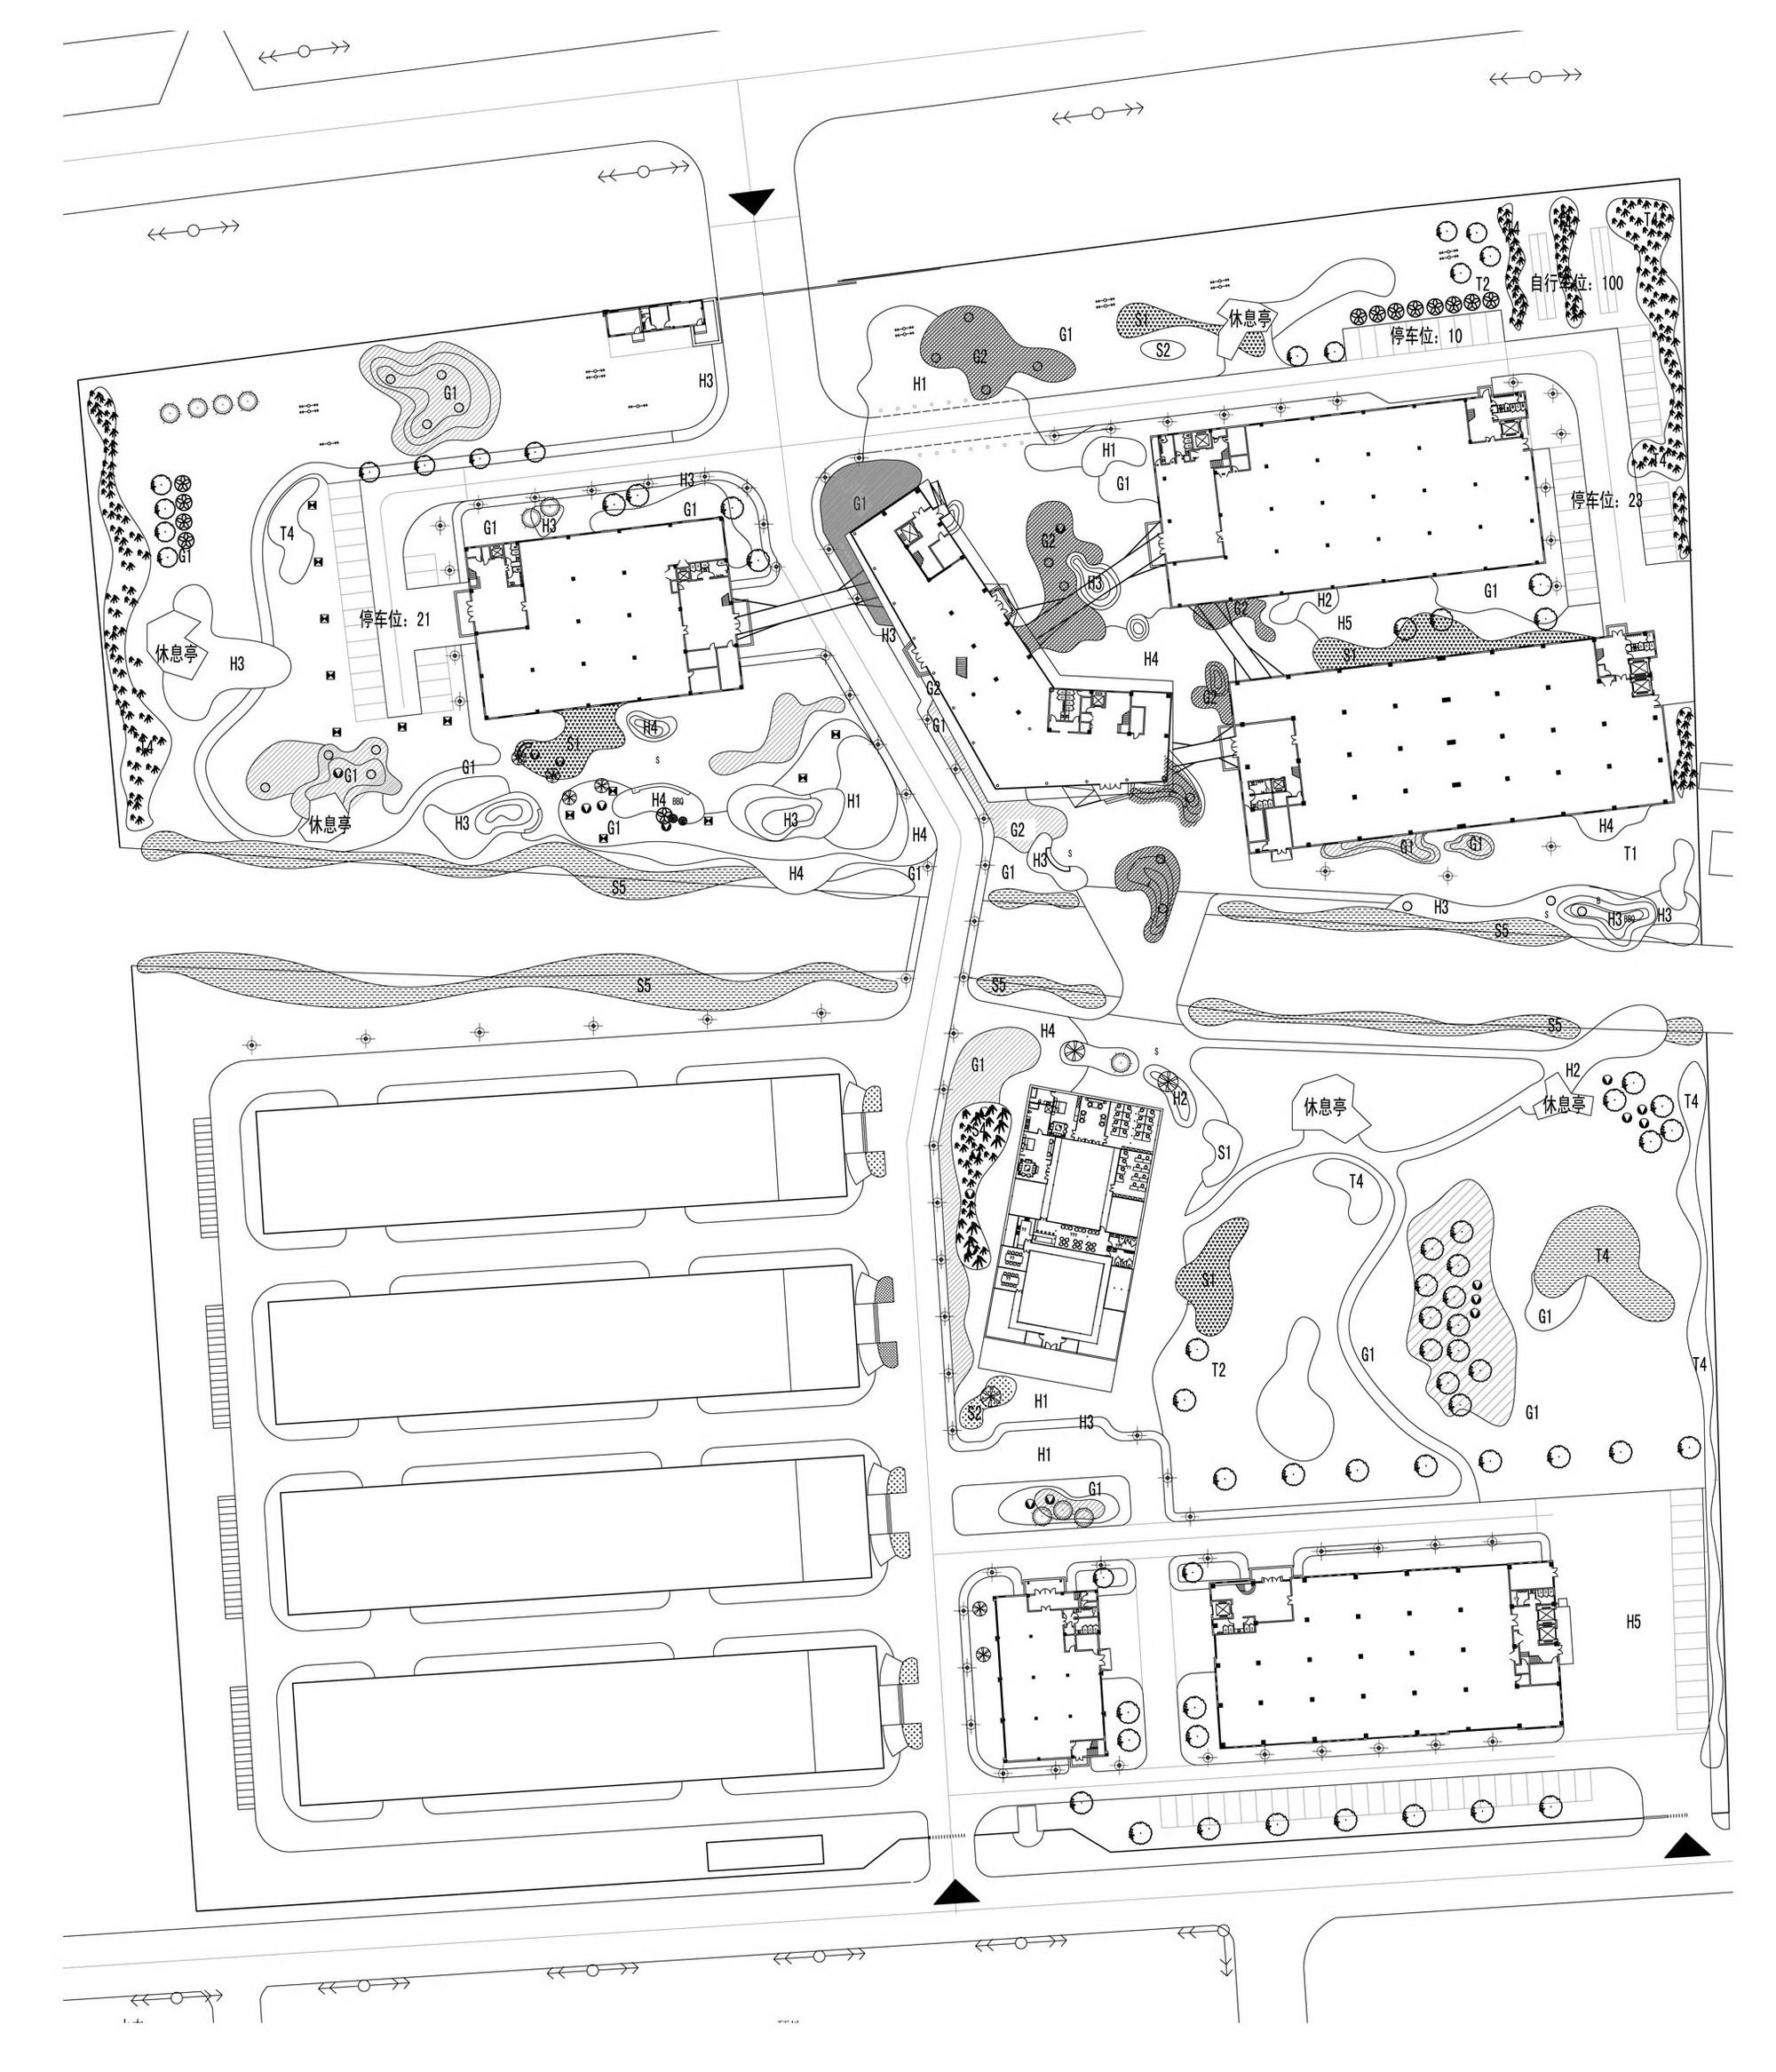 gallery of jia little exhibition center skew collaborative 13 floor plan